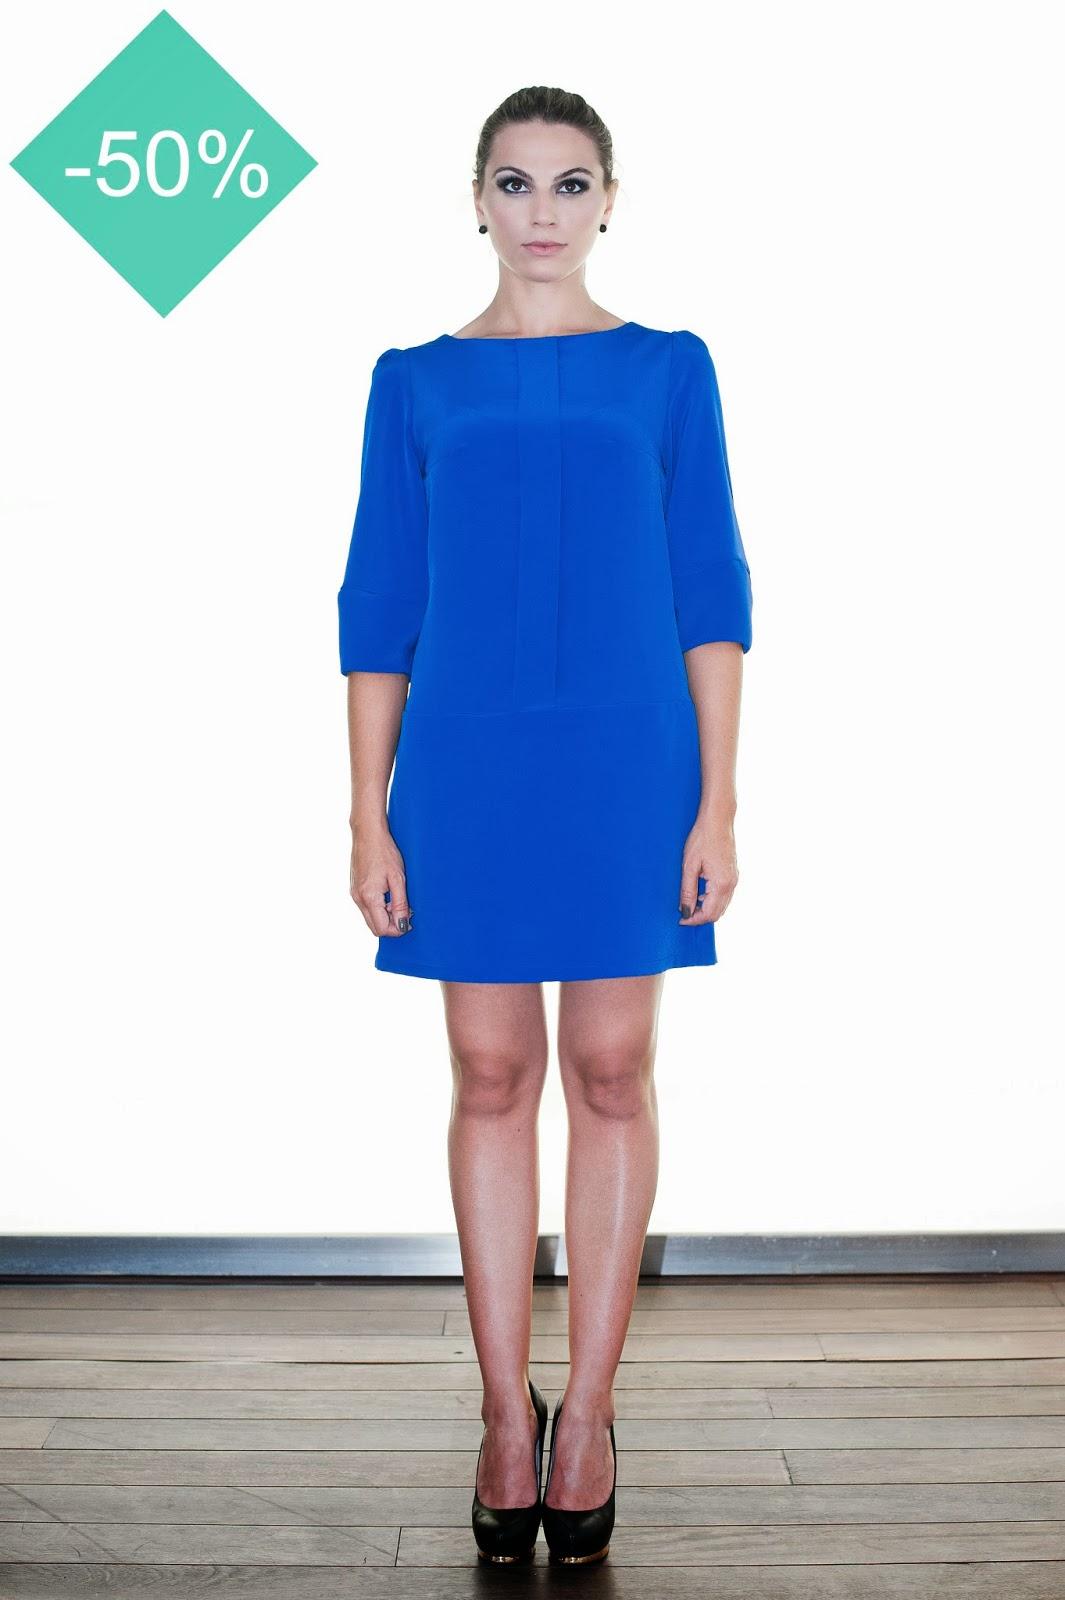 http://labocoqueshop.bigcartel.com/product/vestido-milano#.UuqywPuIrA4